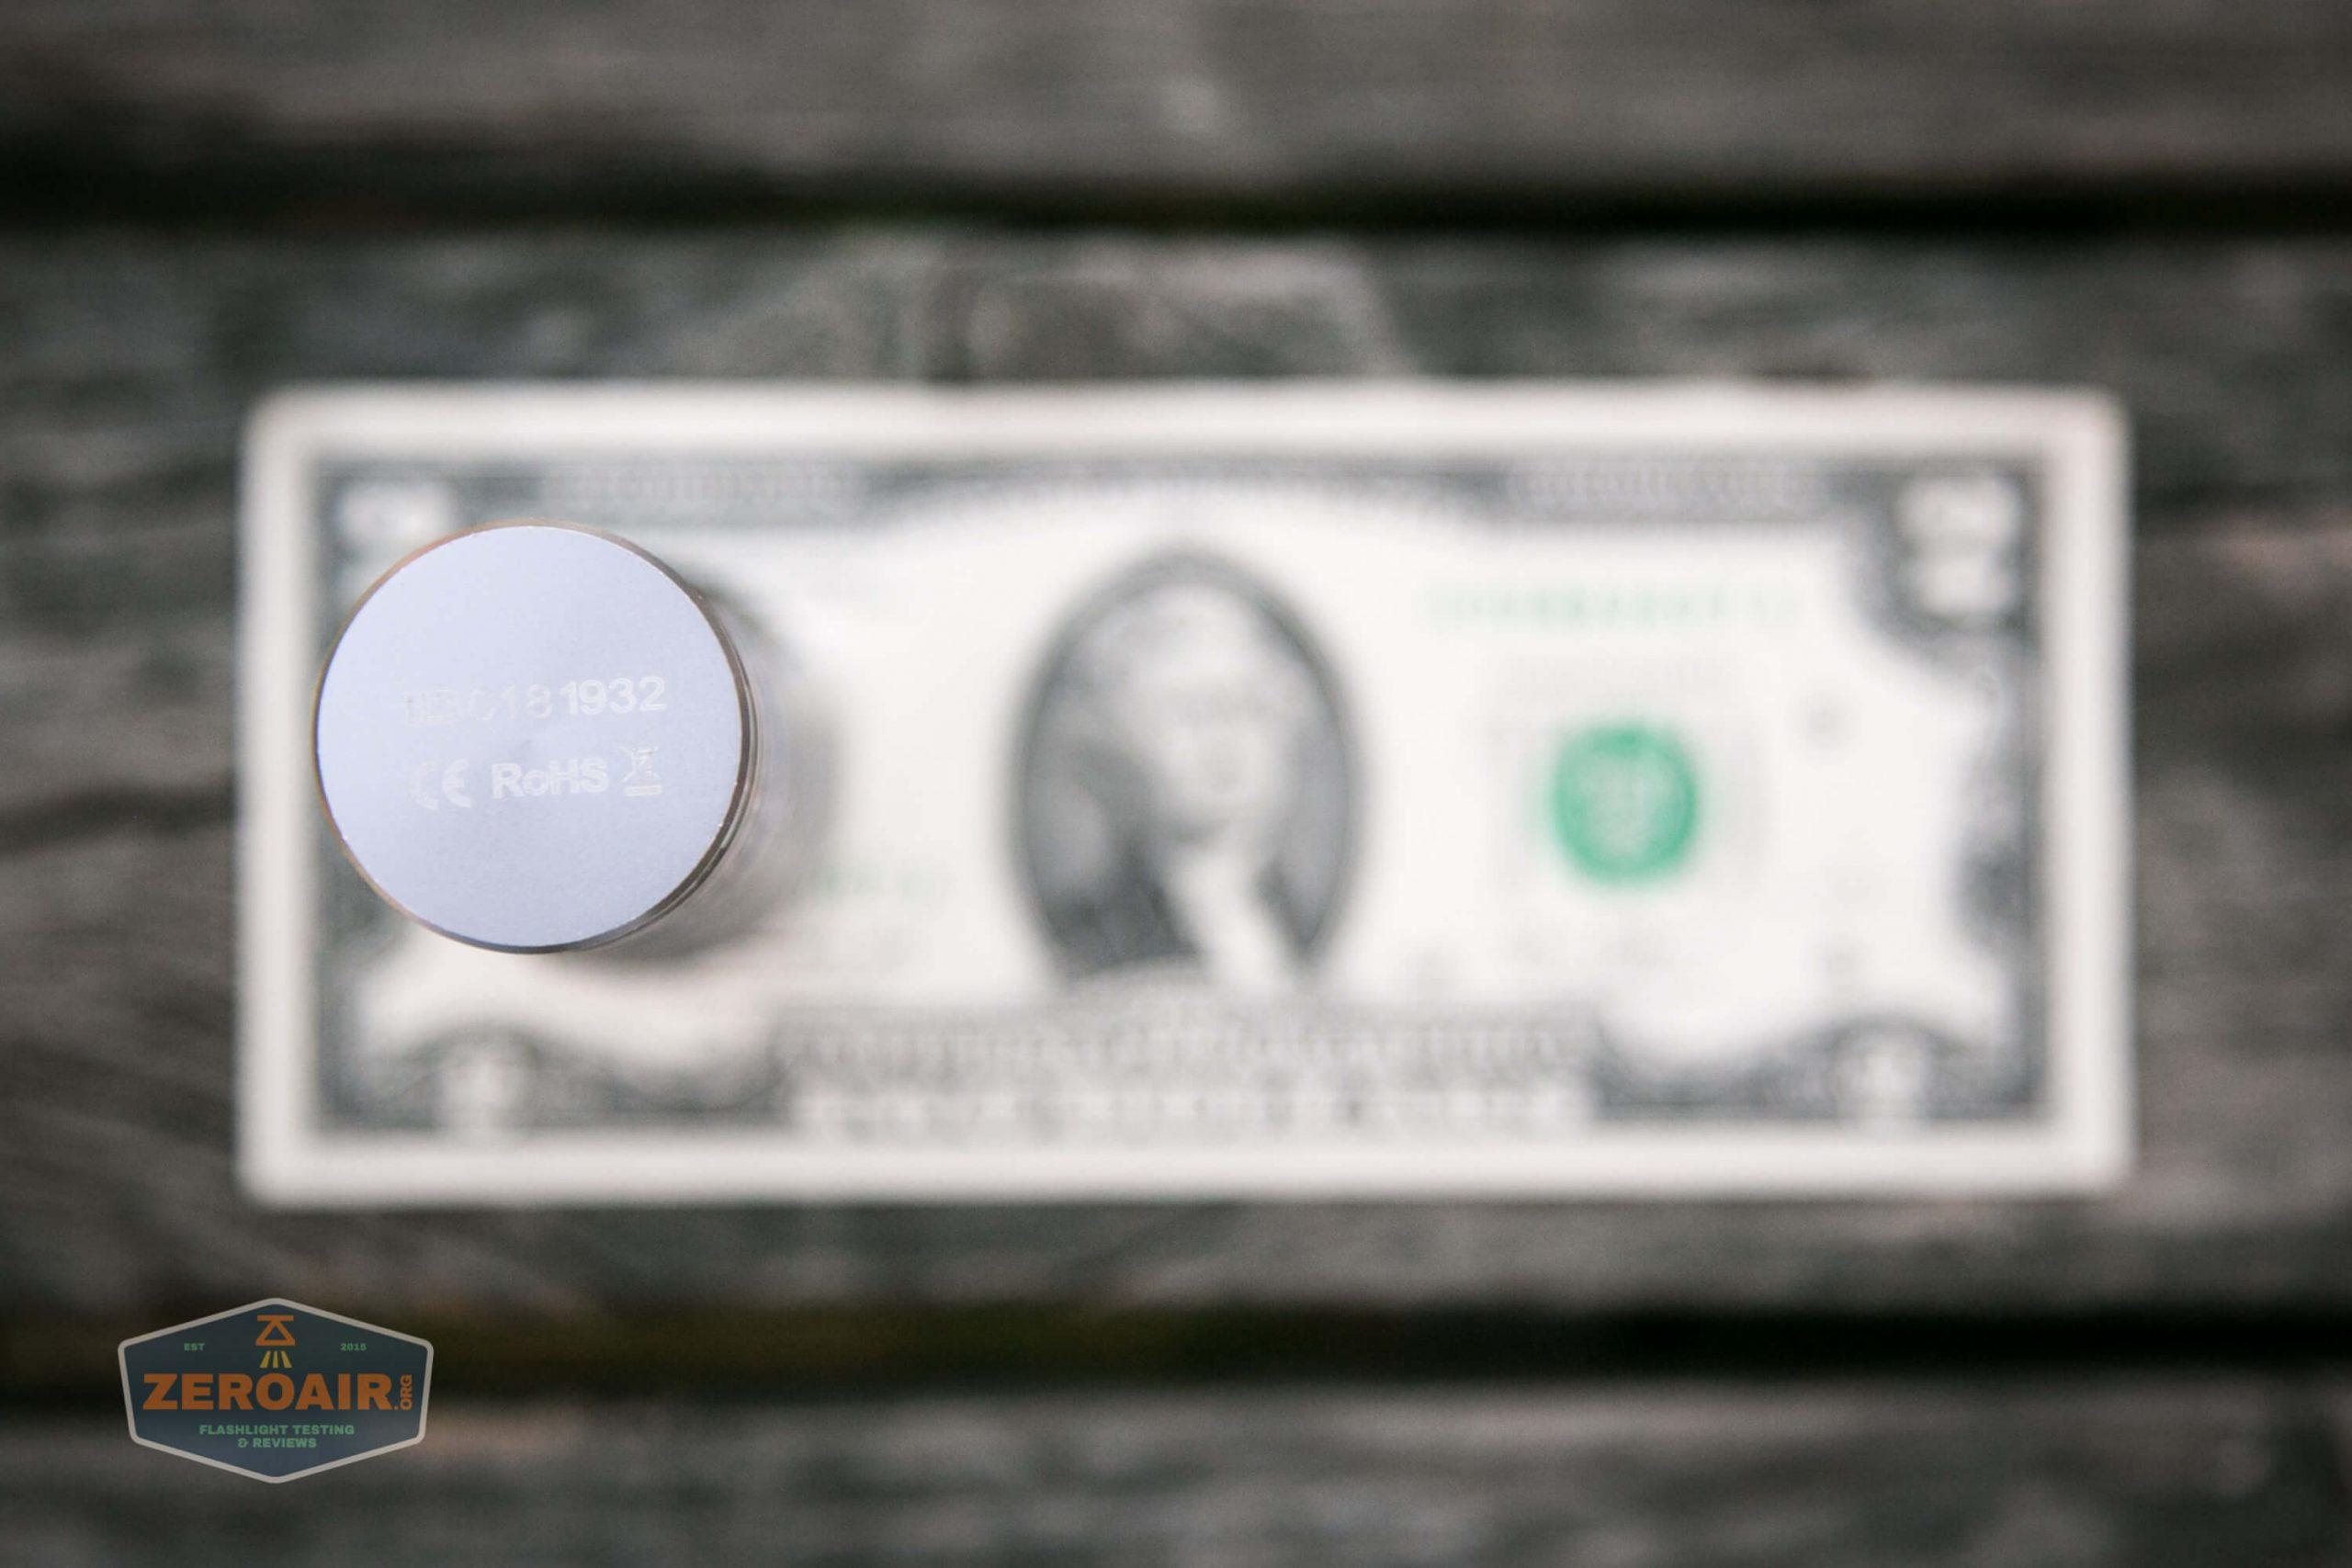 fireflylite e01 luminus sst-40 21700 size on two dollar bill 3